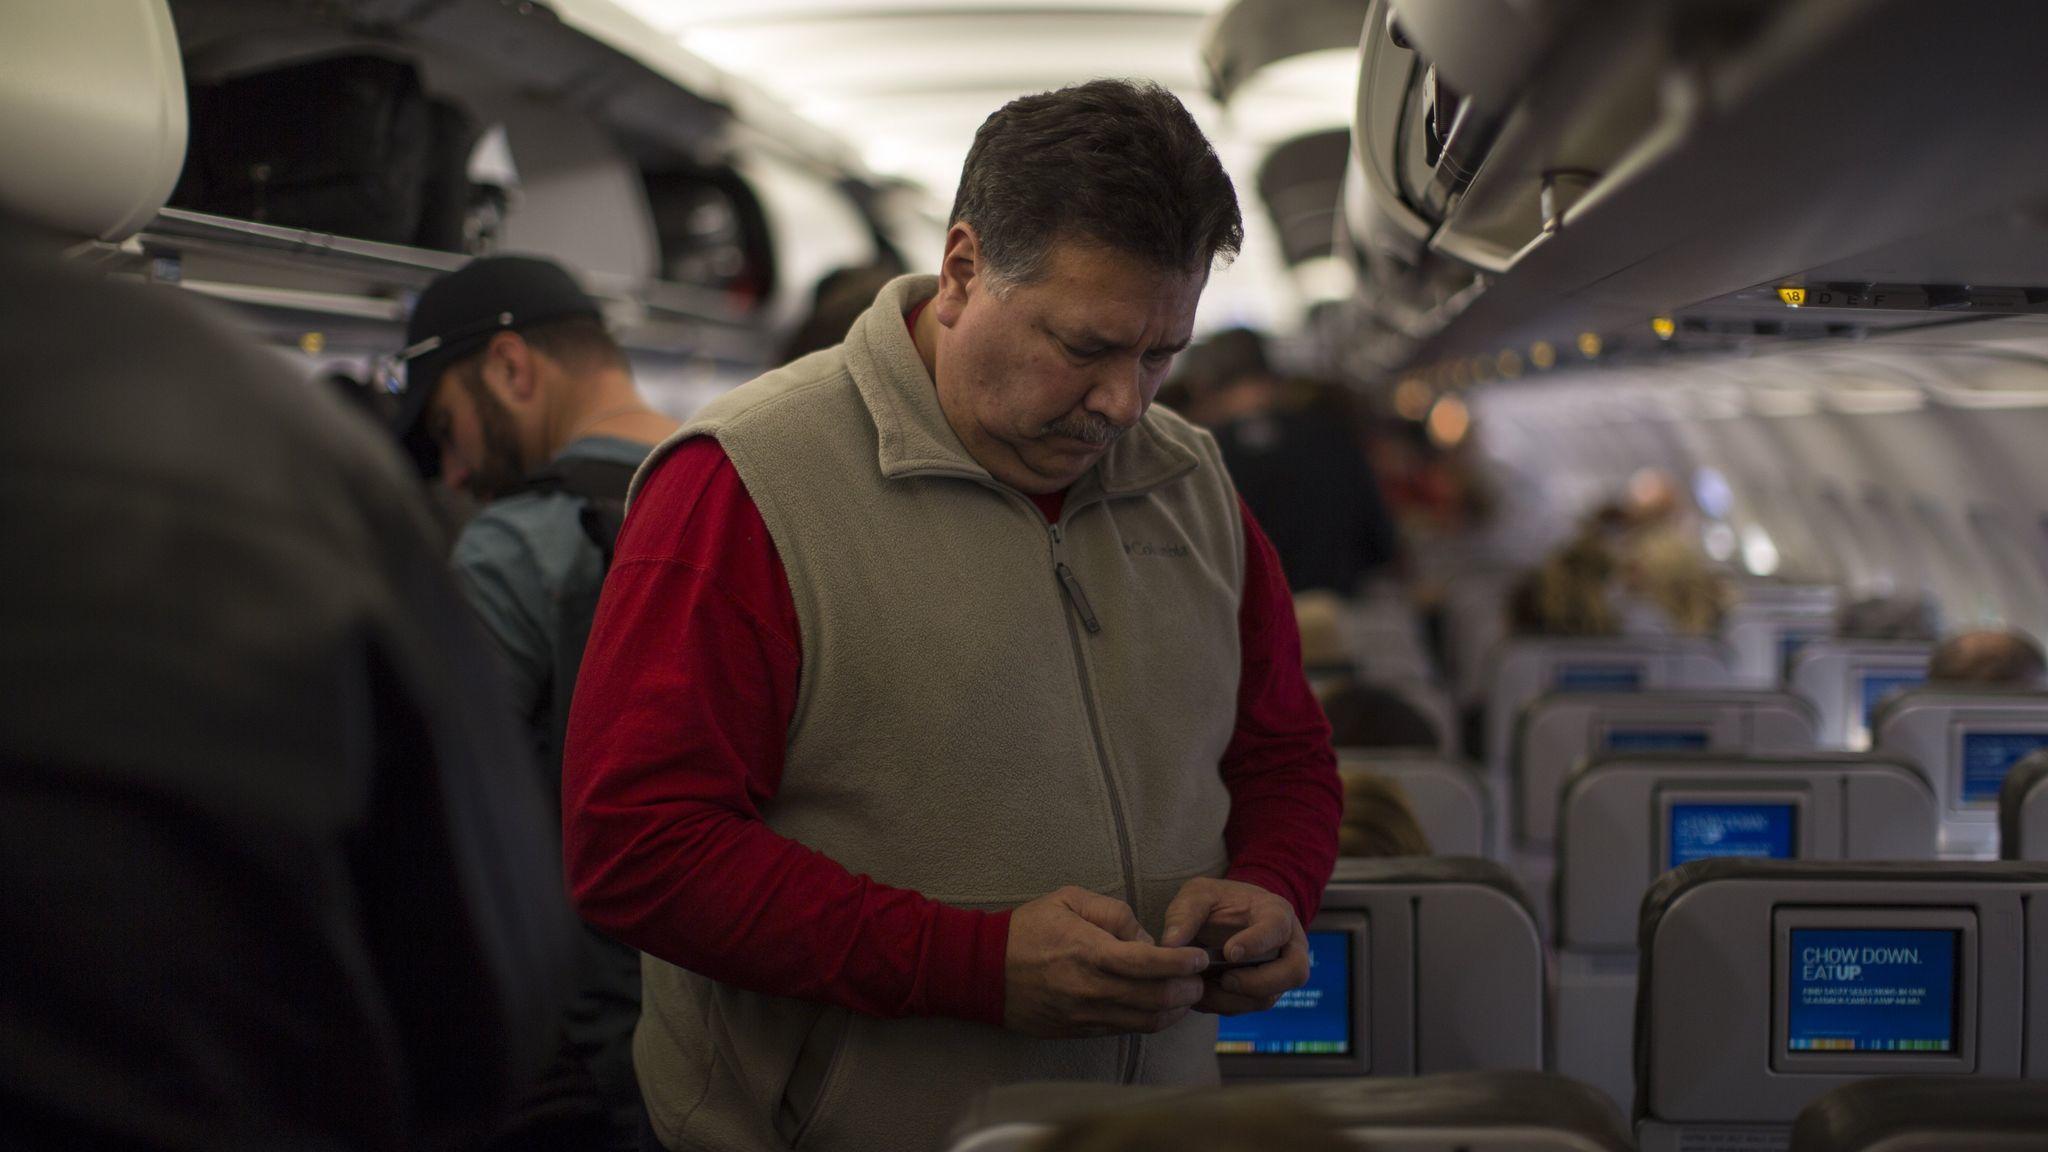 A JetBlue passenger checks his cellphone before disembarking at Long Beach Airport.